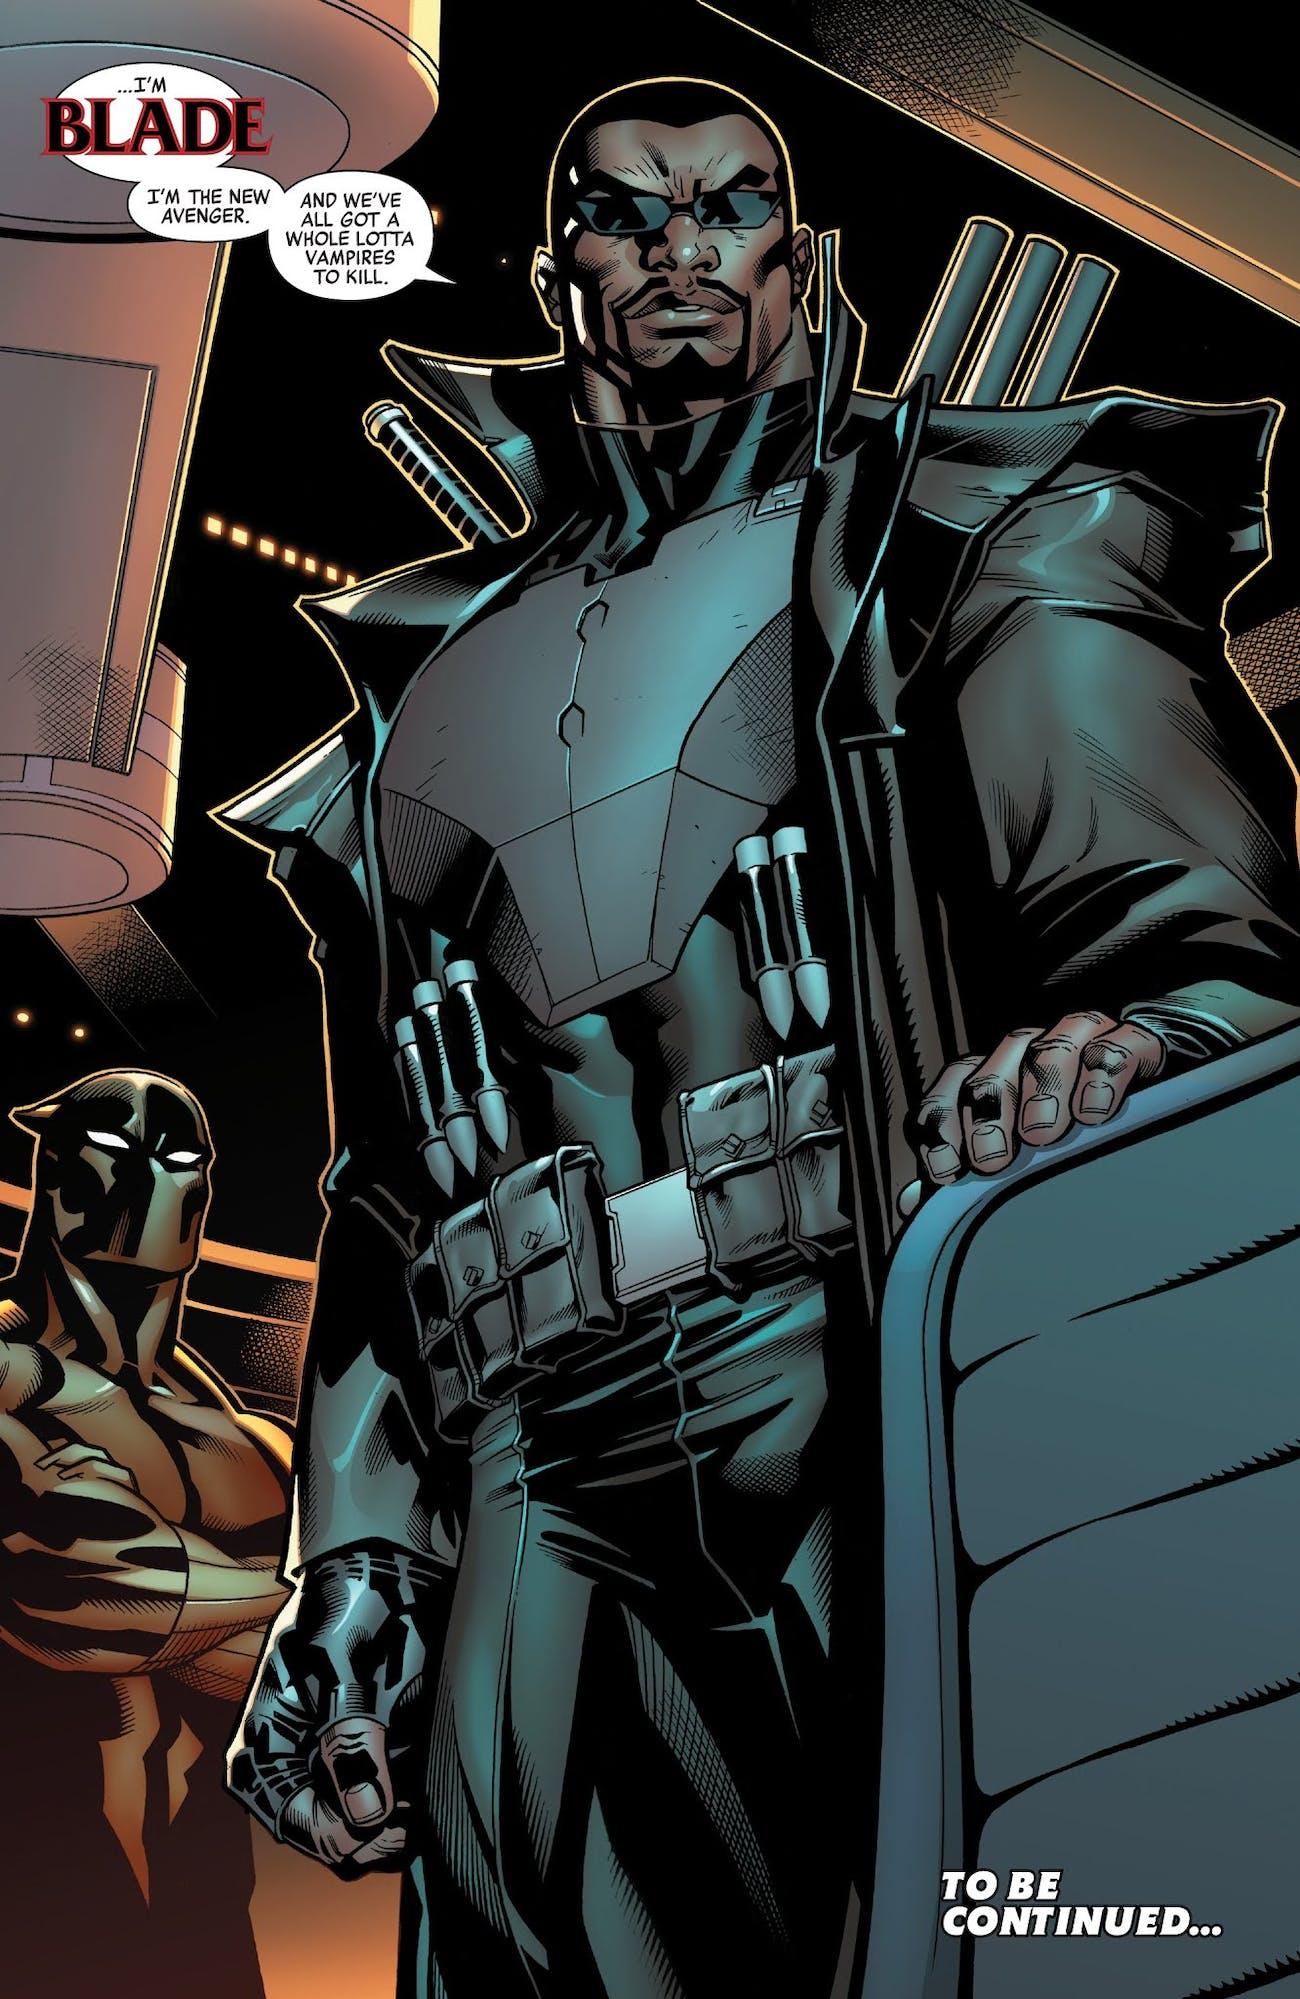 The Avengers Jason Aaron Black Panther Blade